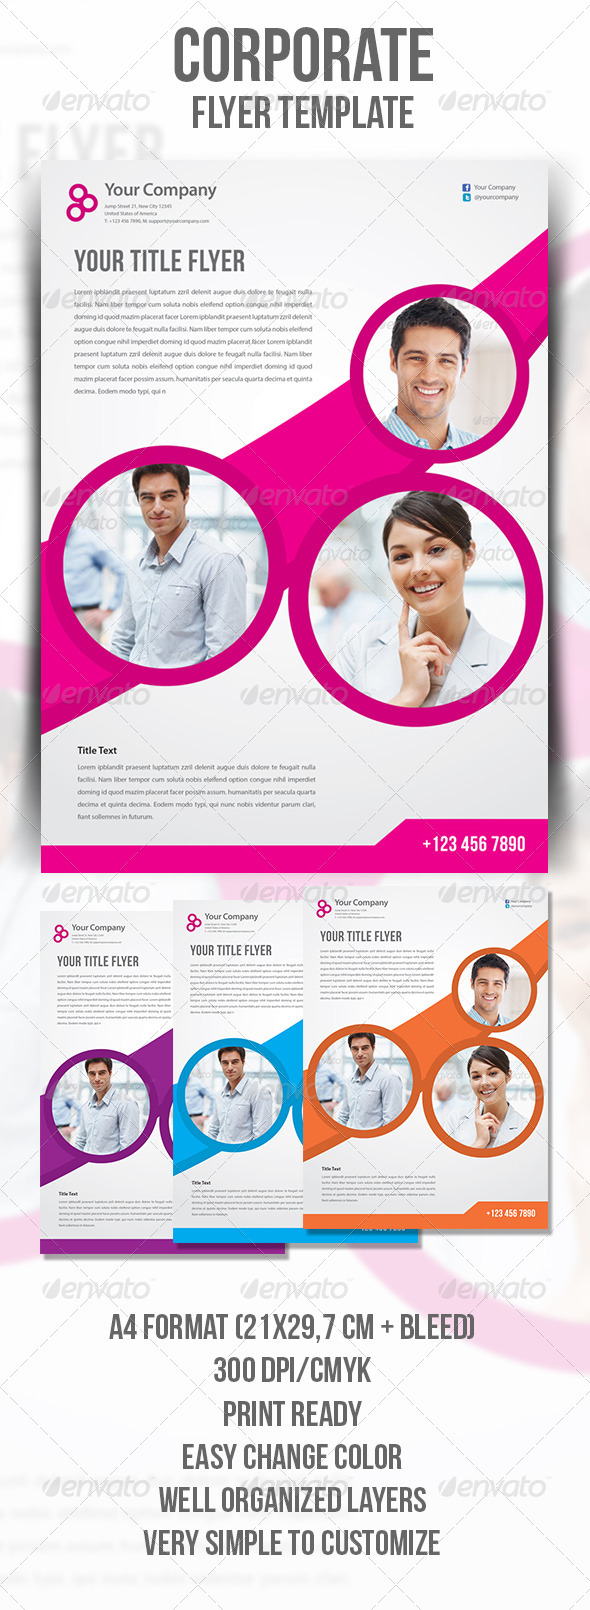 GraphicRiver Corporate Flyer Template 4504772